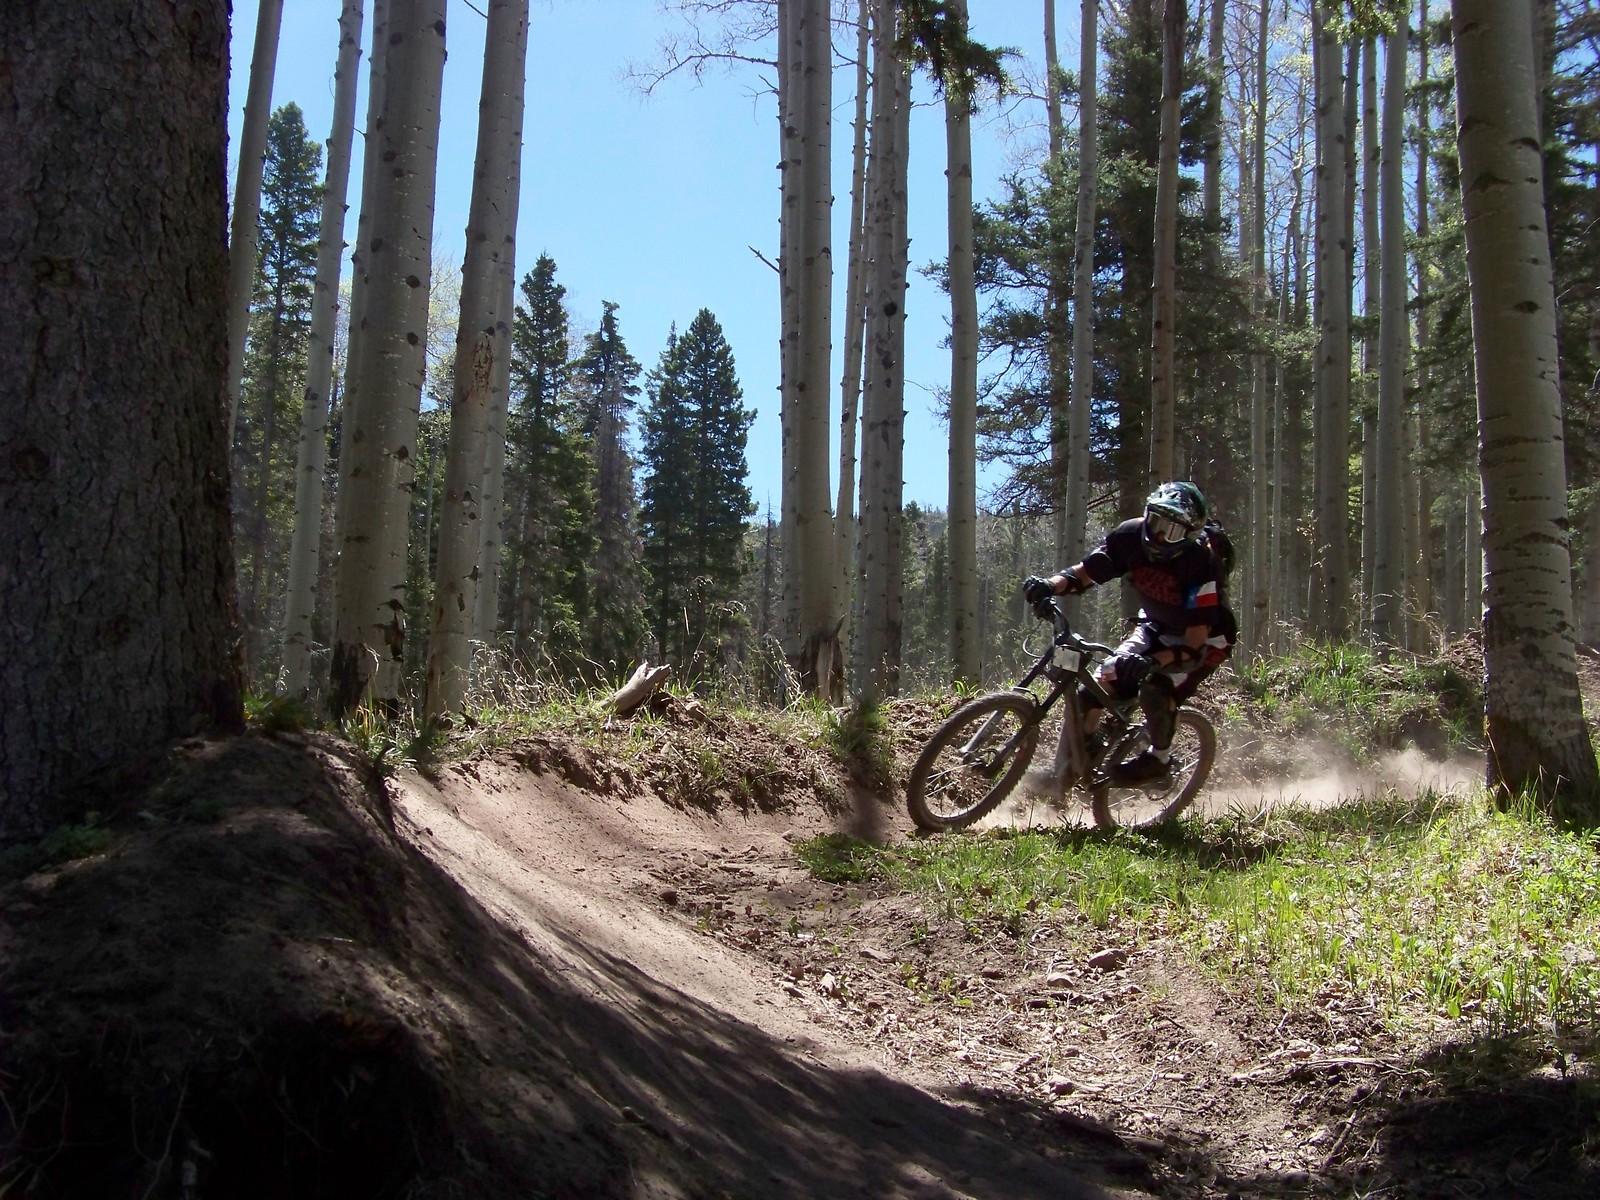 100 9783 - falconar - Mountain Biking Pictures - Vital MTB